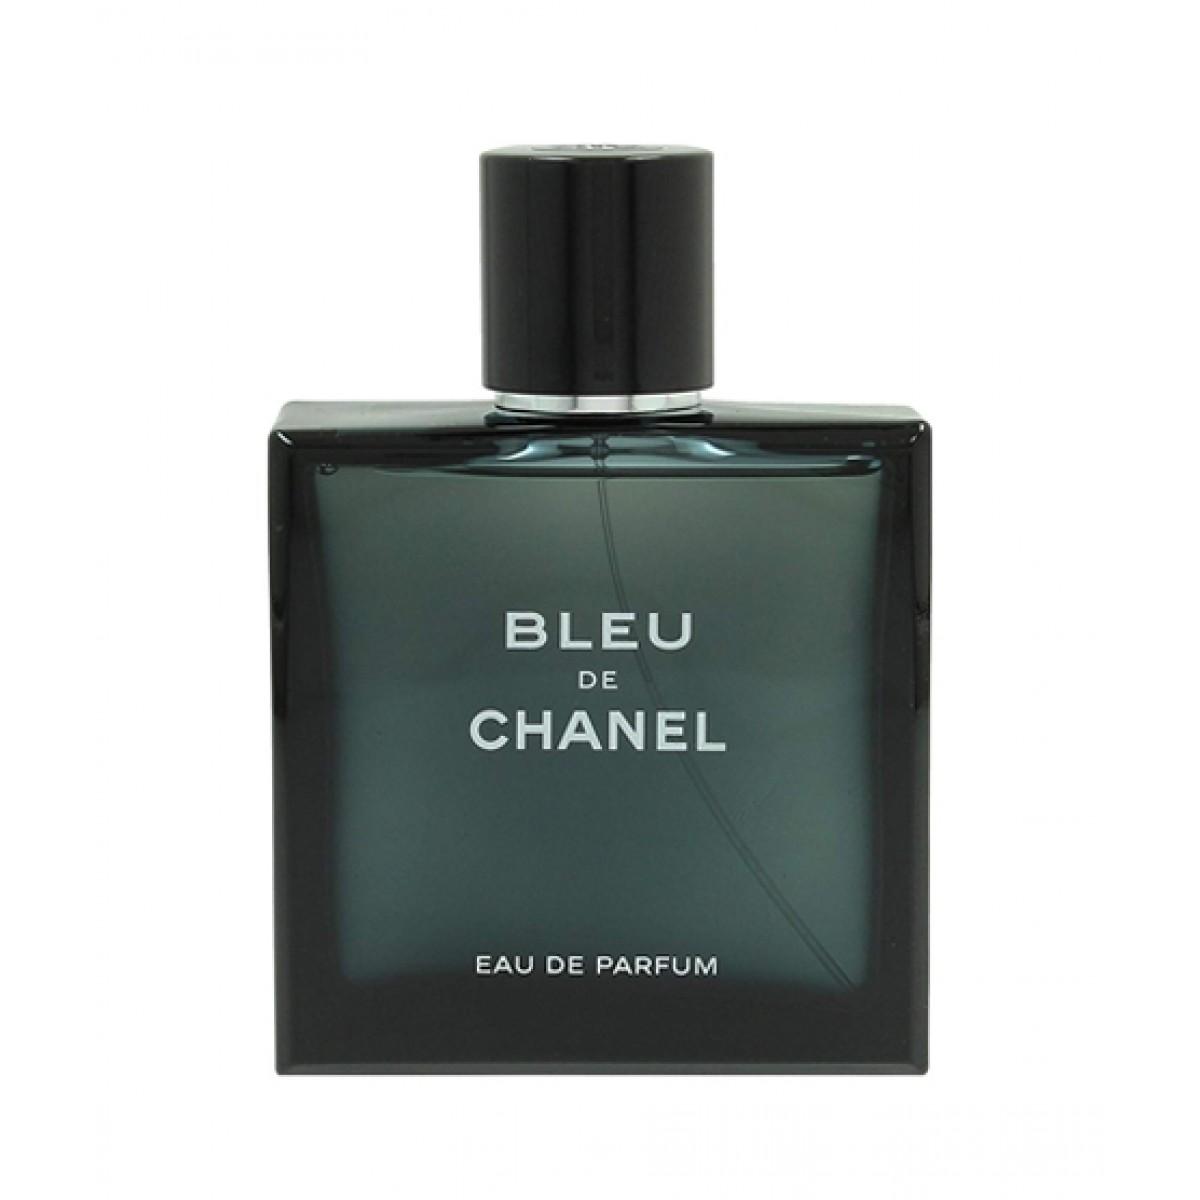 c6b5c4ae567 Chanel Bleu De Chanel For Men Price in Pakistan